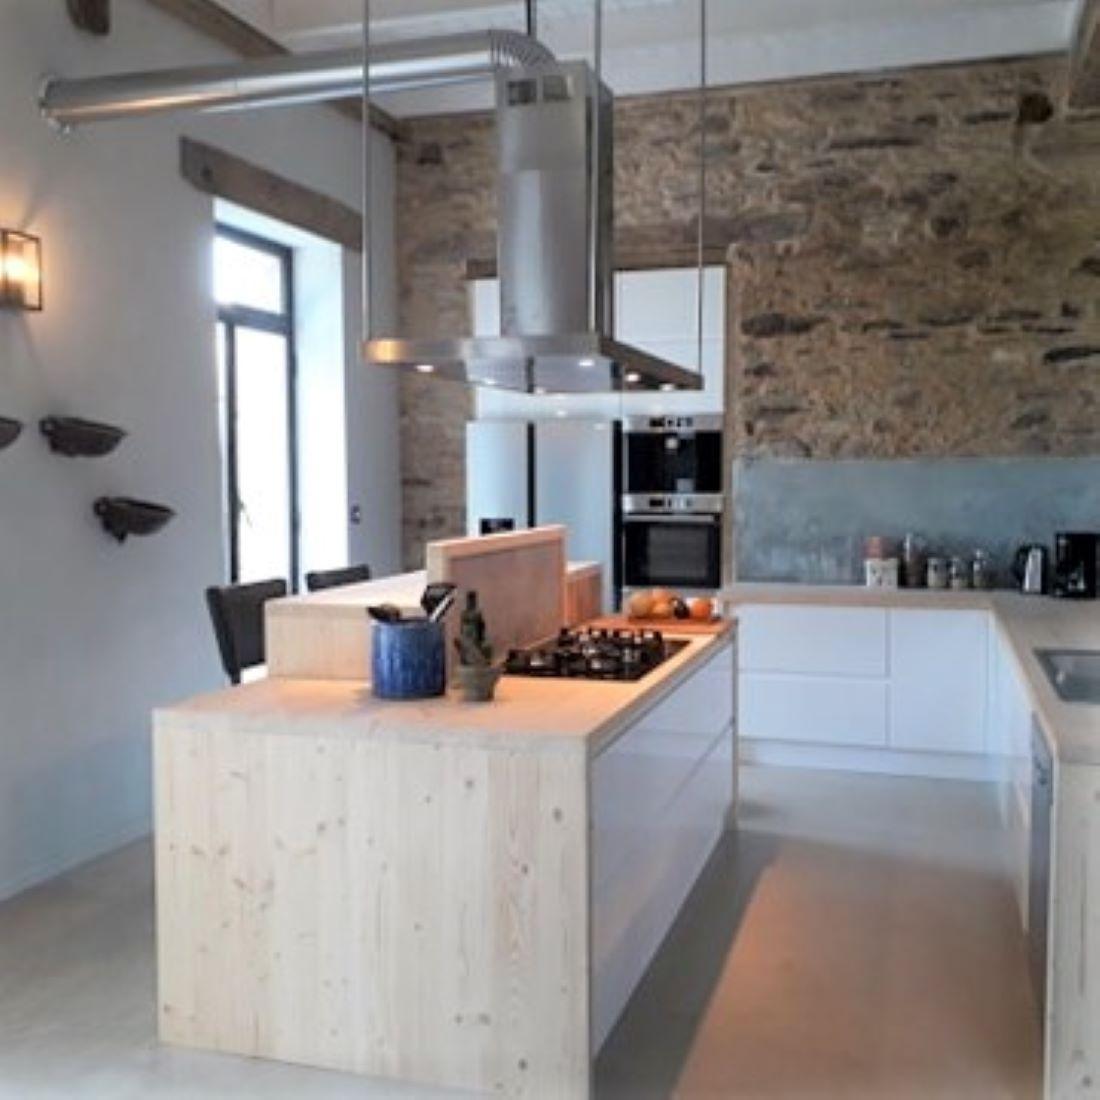 Grote keuken met moderne apparatuur en ontbijtbar